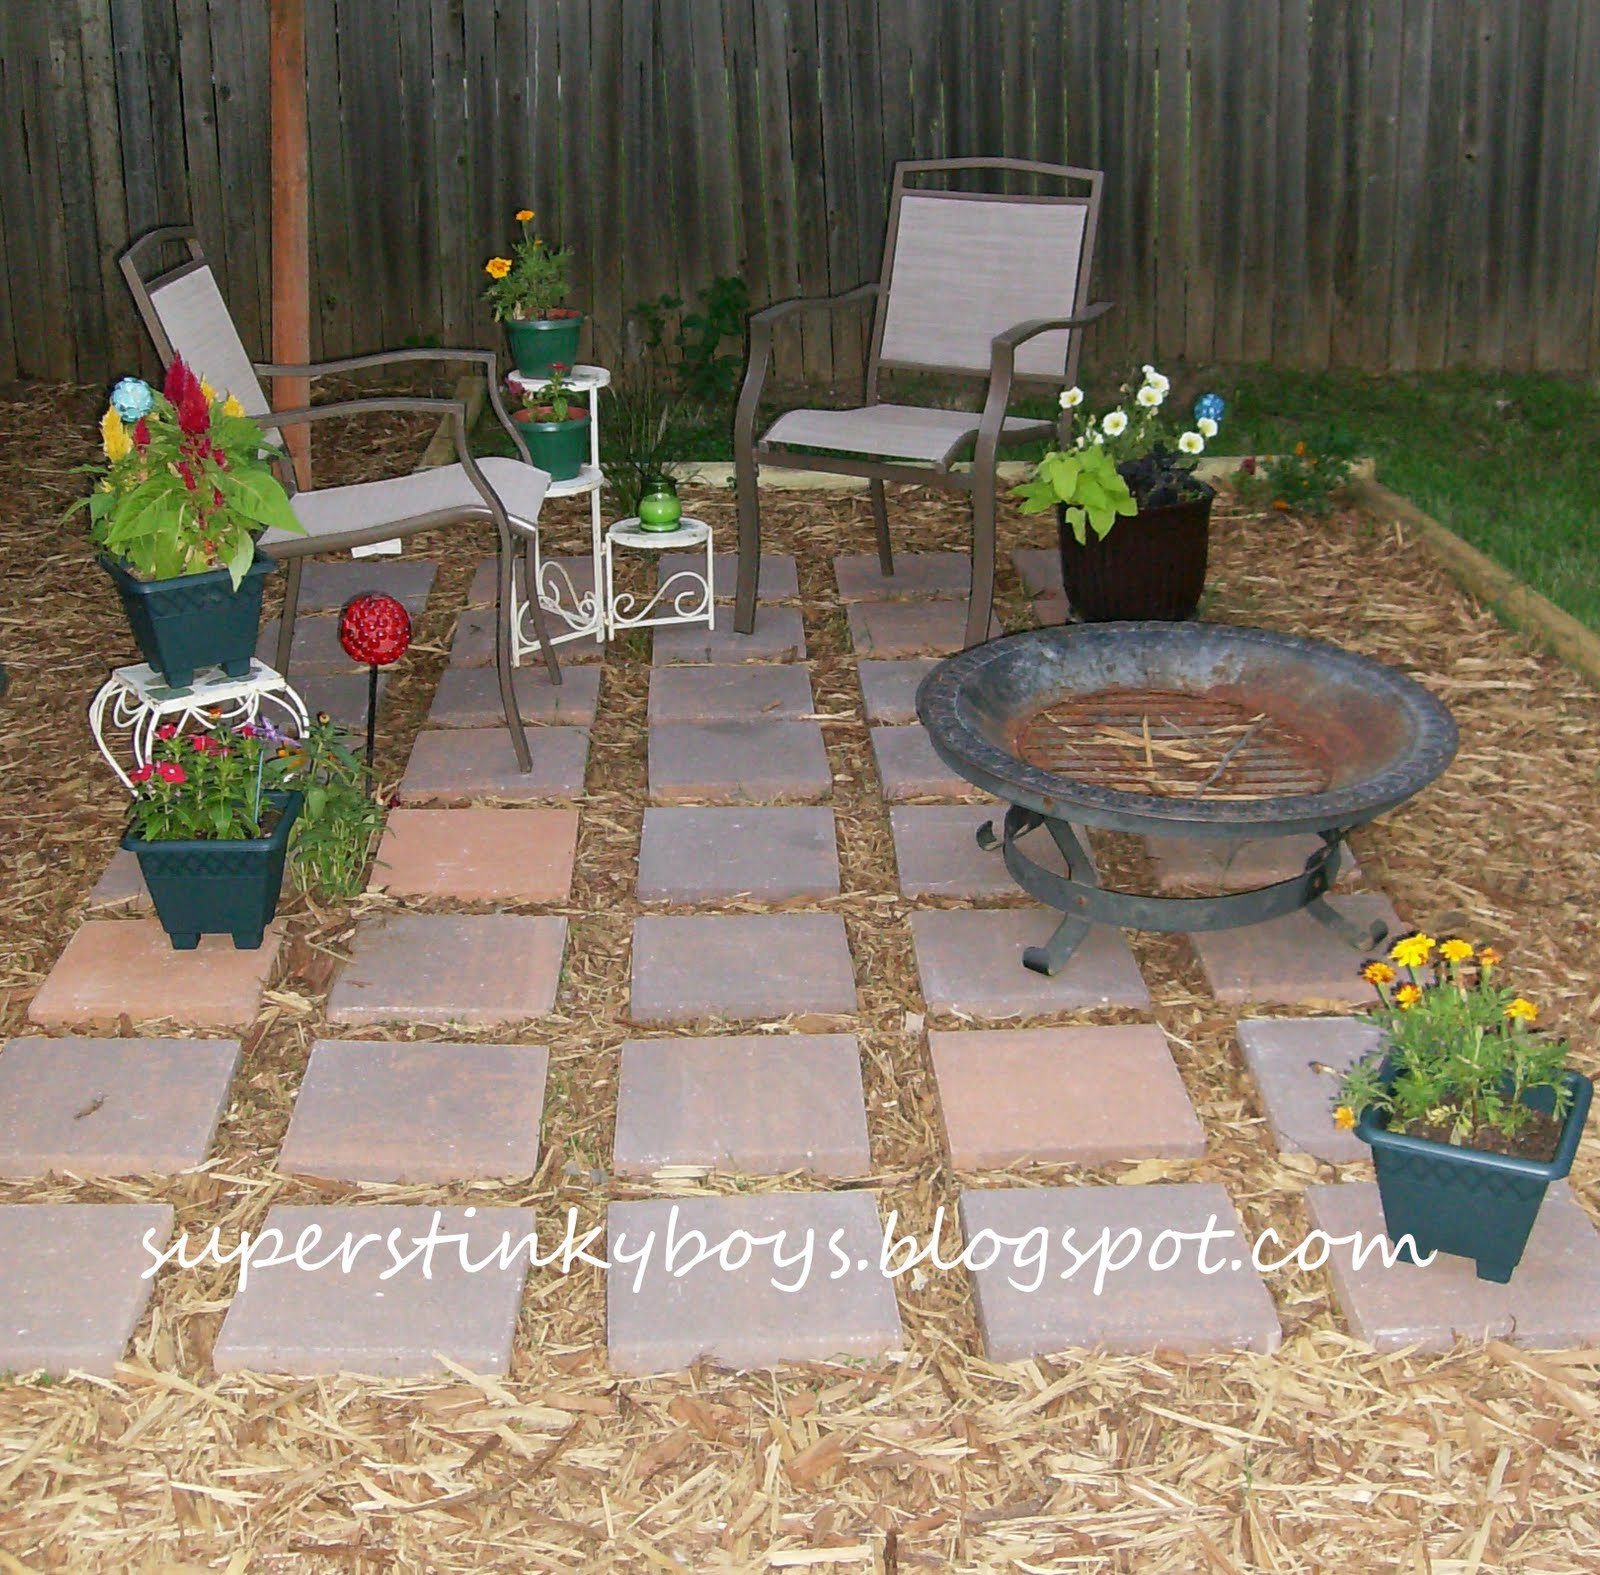 Diy backyard ideas cheap - large and beautiful photos. Photo to